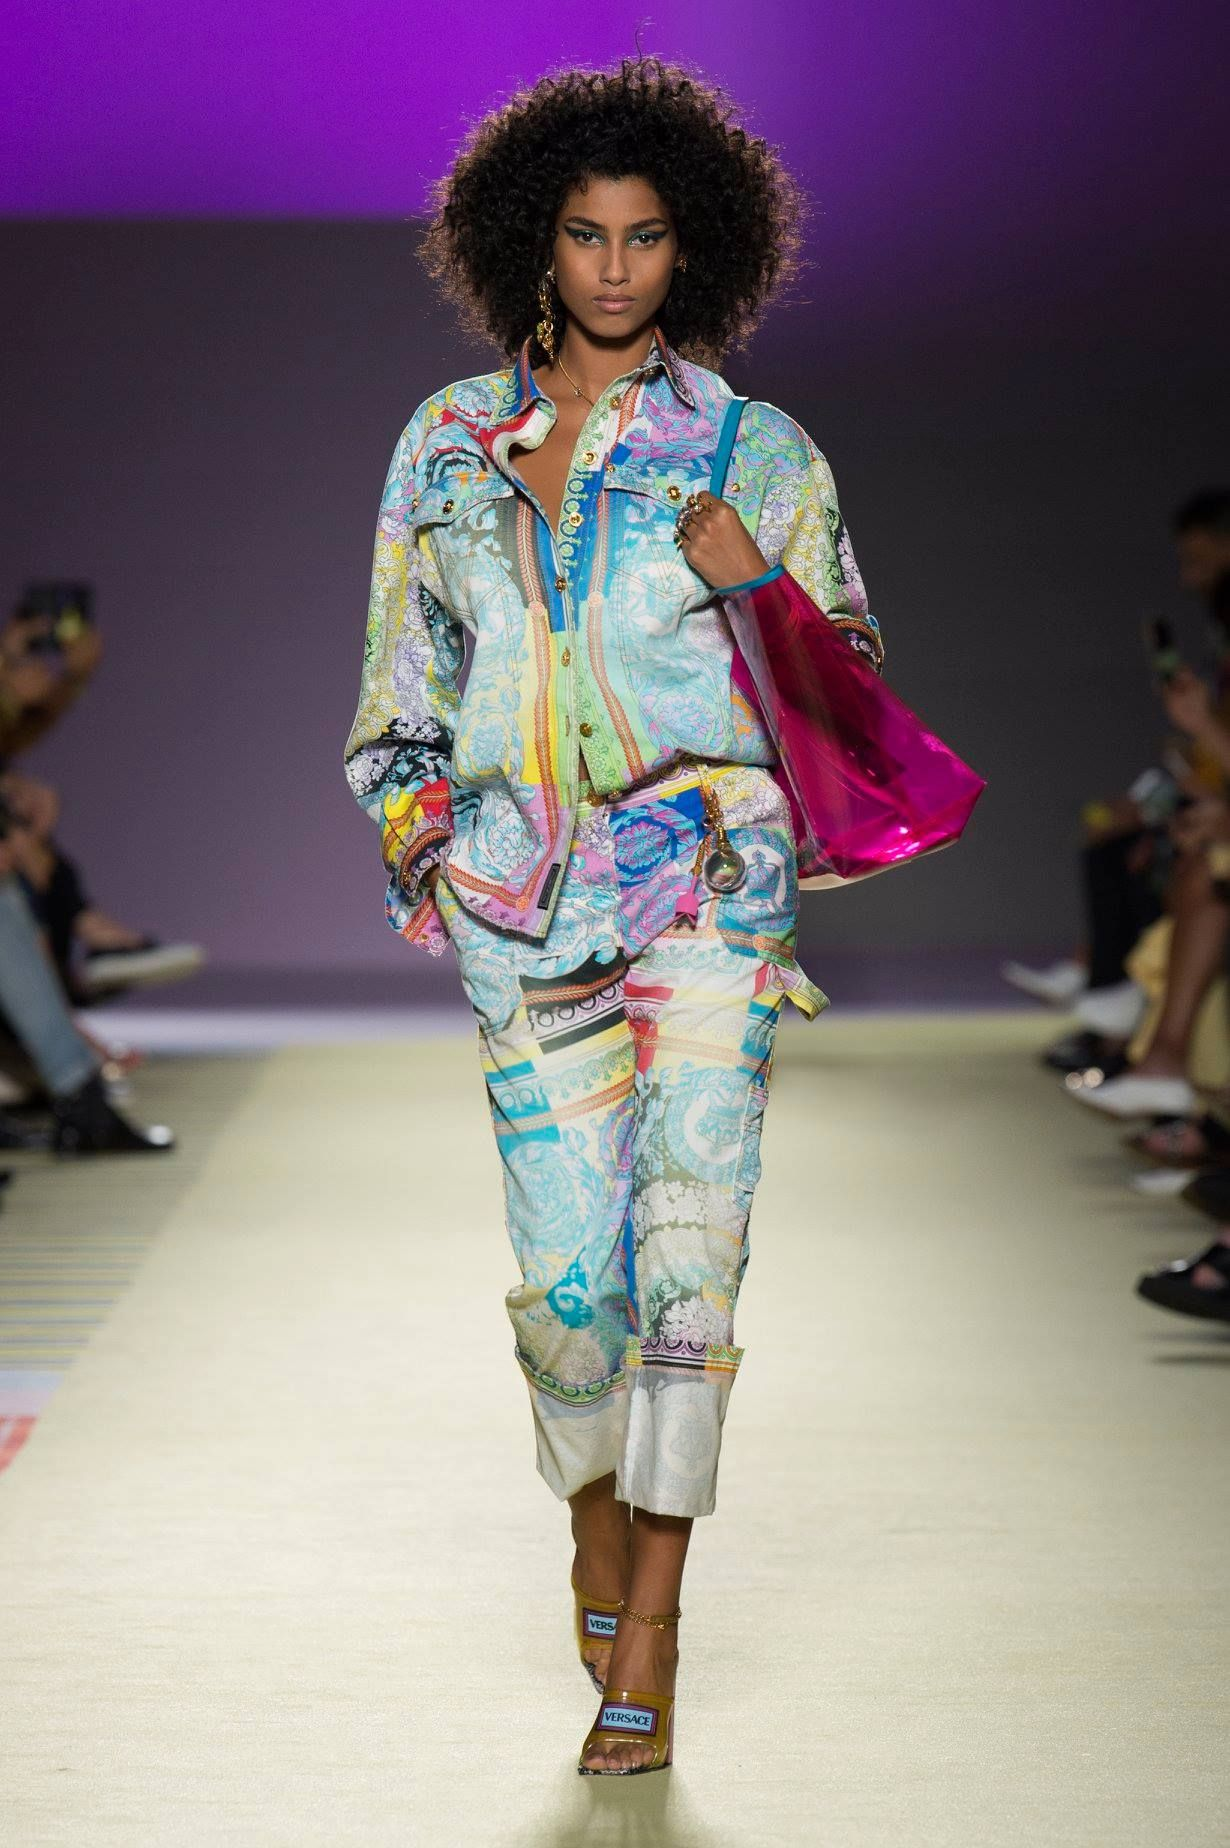 Versace Spring Summer 2019 Look 33 | Fashion, Versace